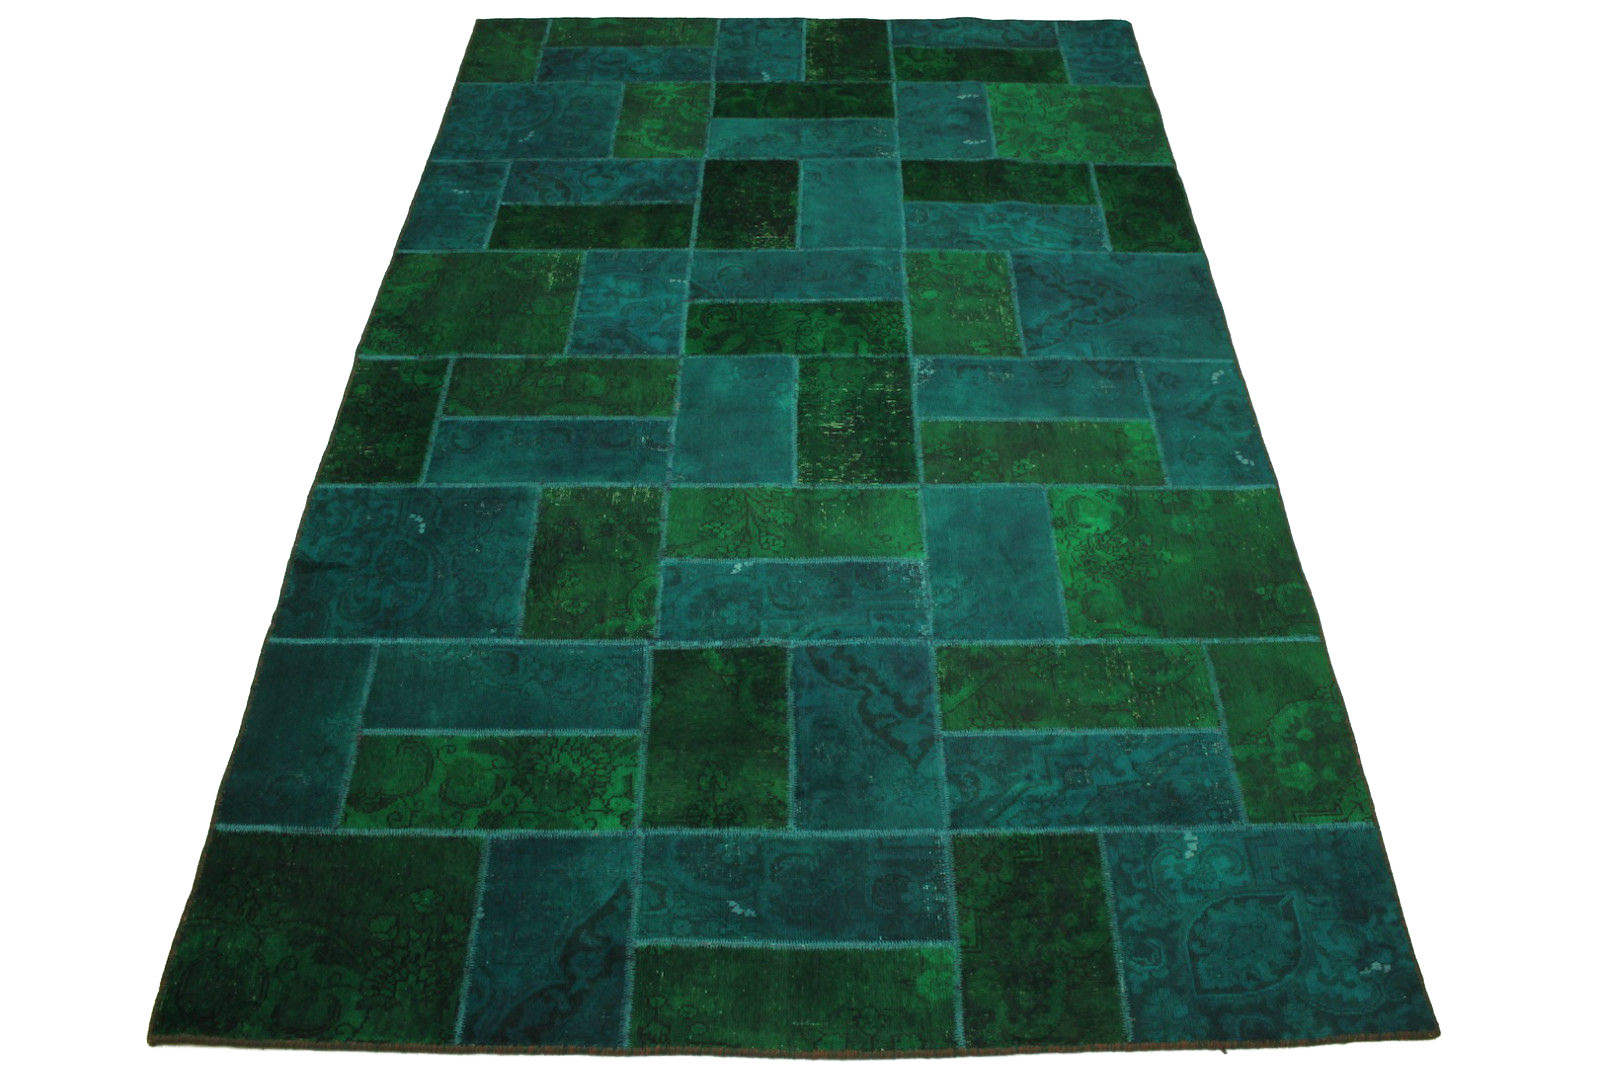 patchwork teppich gr n t rkis in 310x200cm 1001 1856 bei kaufen. Black Bedroom Furniture Sets. Home Design Ideas